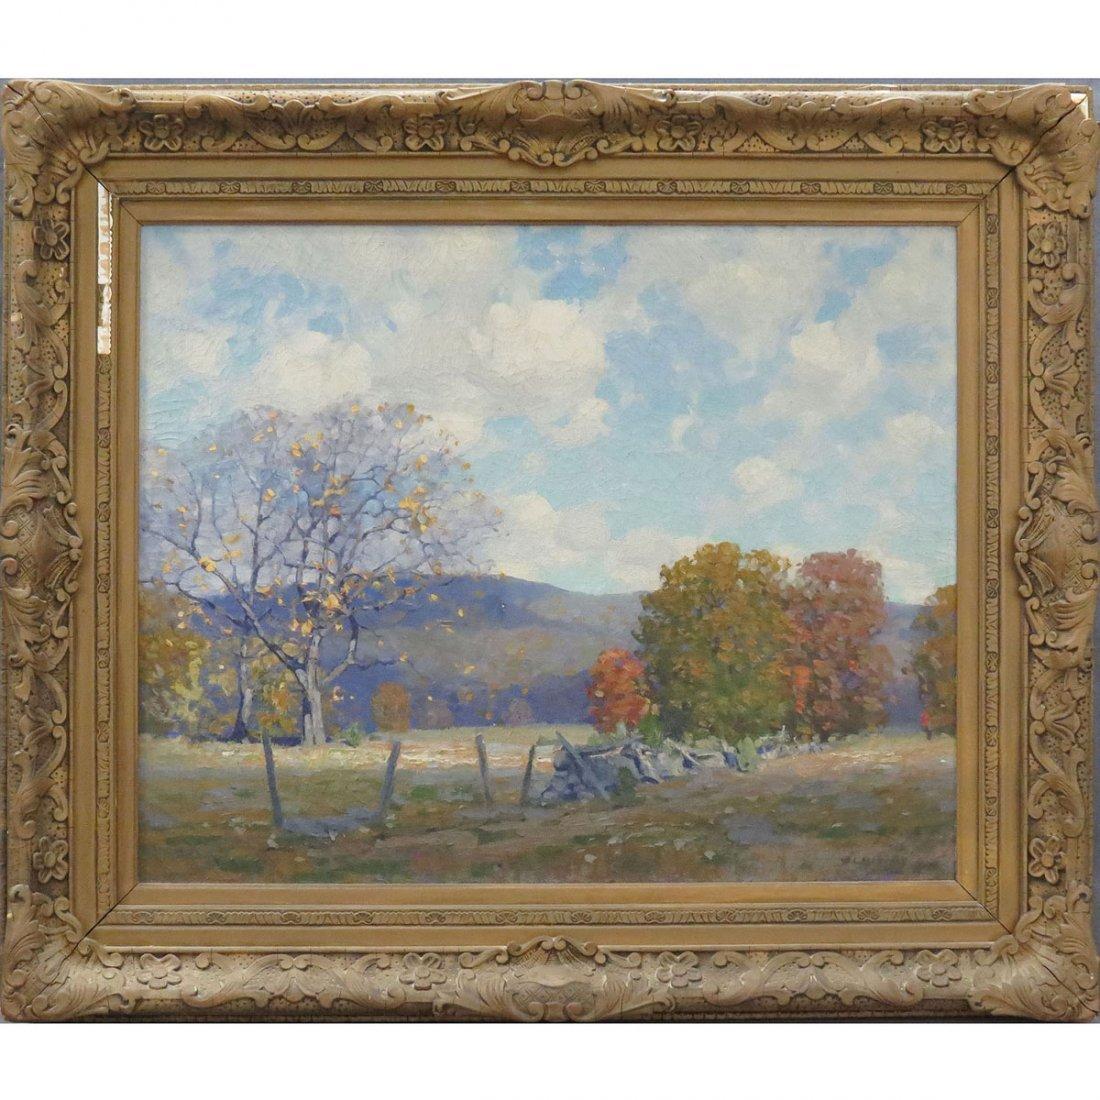 WILLARD LEROY METCALF (AMERICAN/NY 1858-1925), OIL